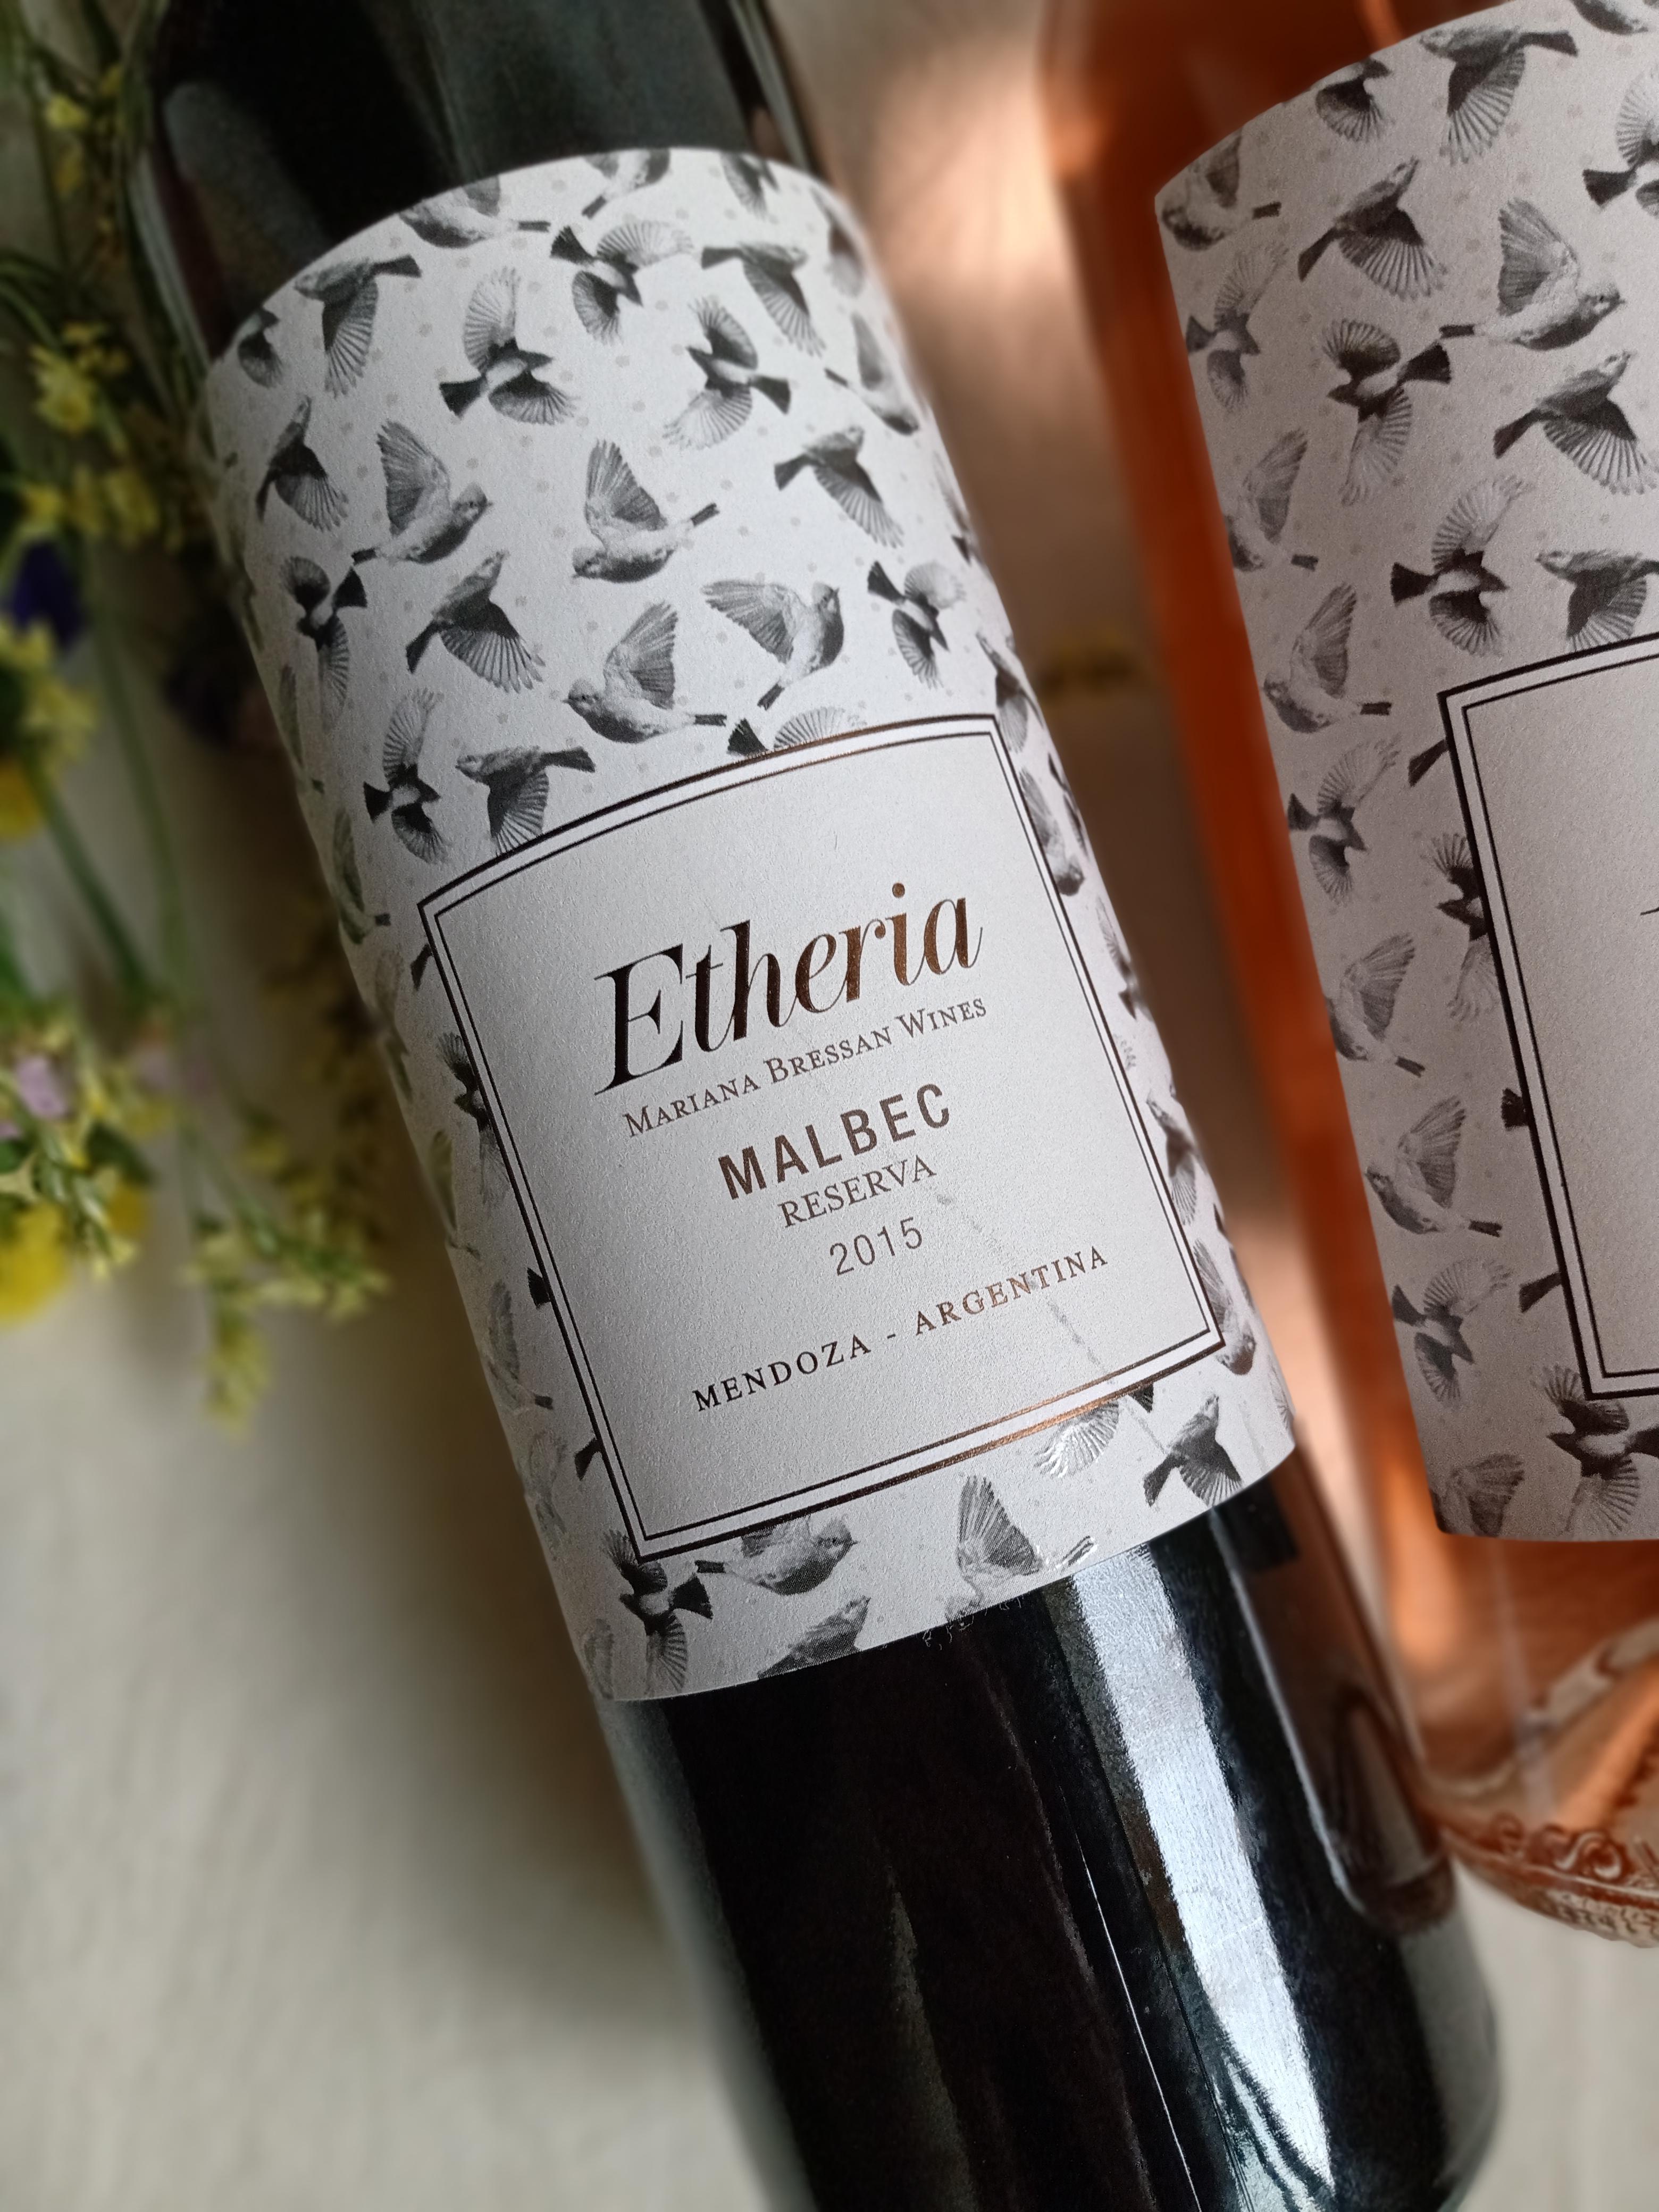 Etheria Malbec Reserva